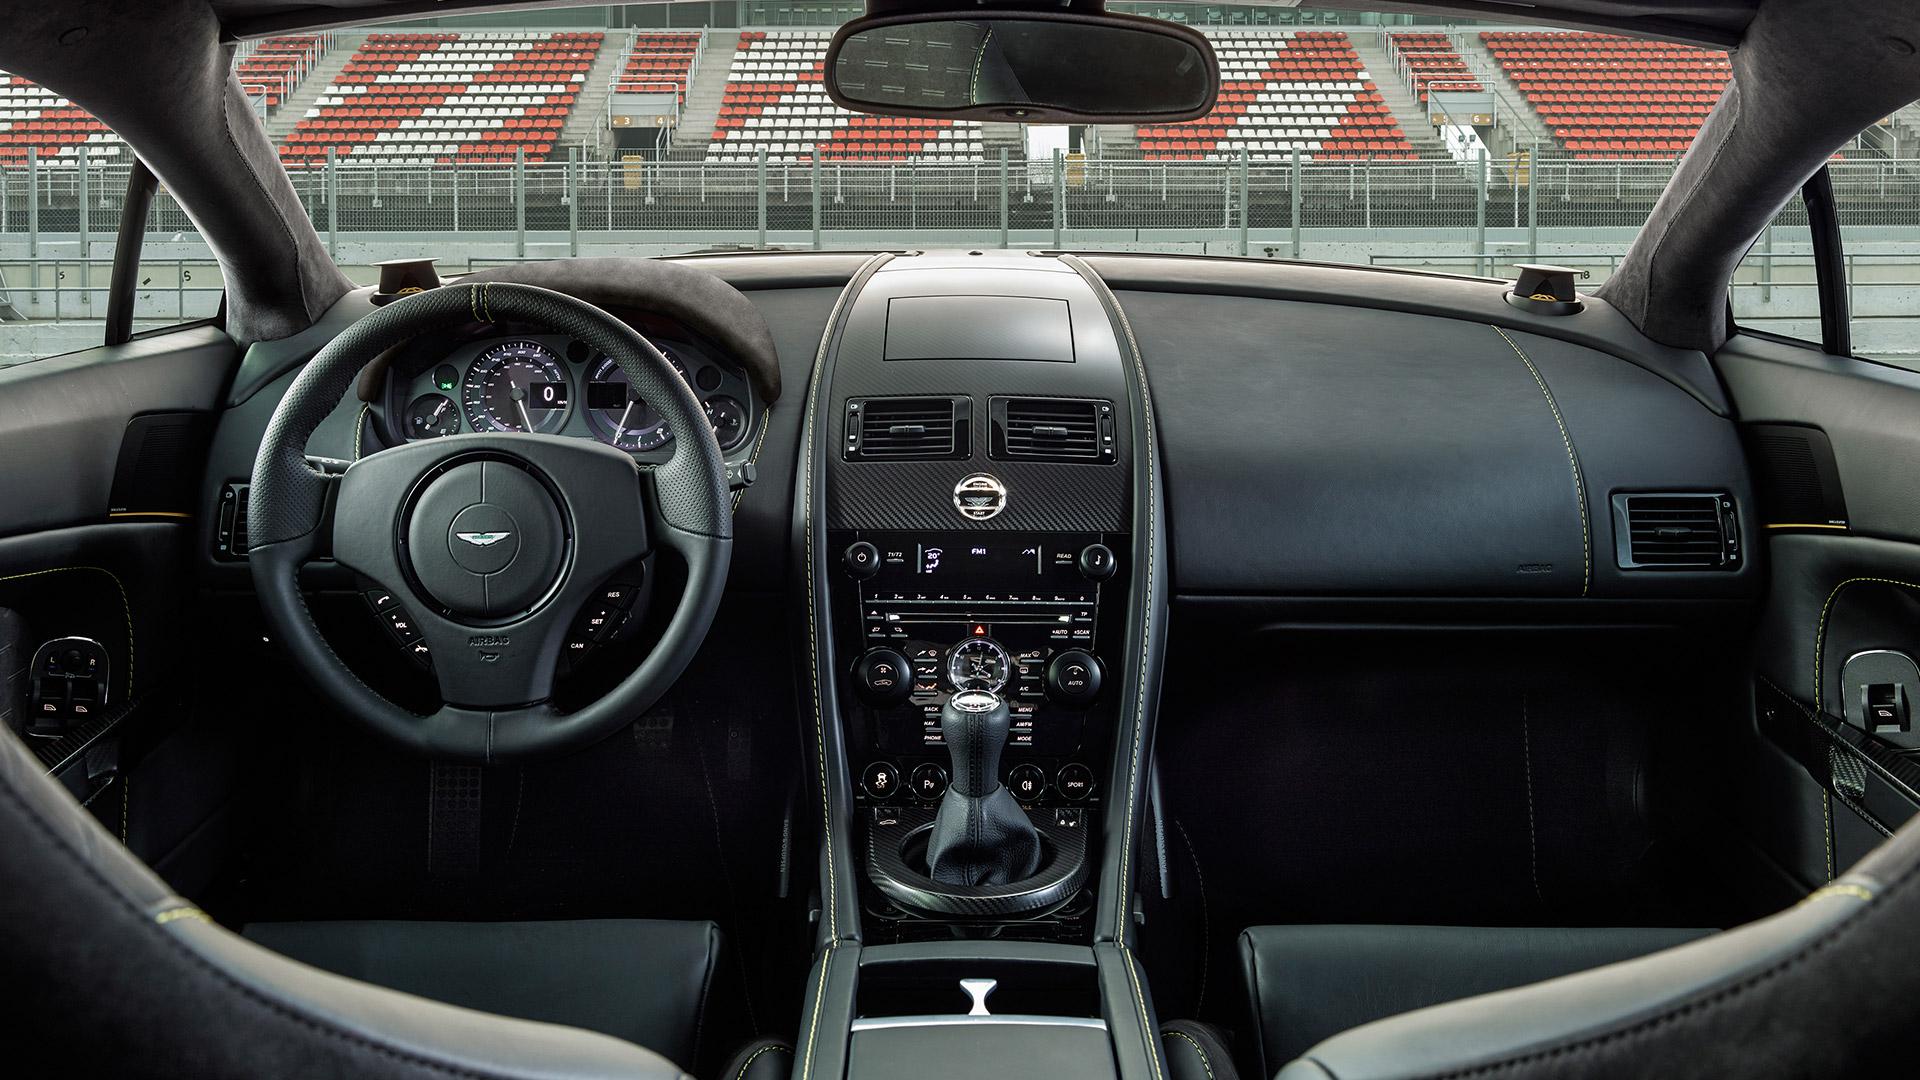 Aston Martin Vantage N430 2013 STD Interior Car s Overdrive